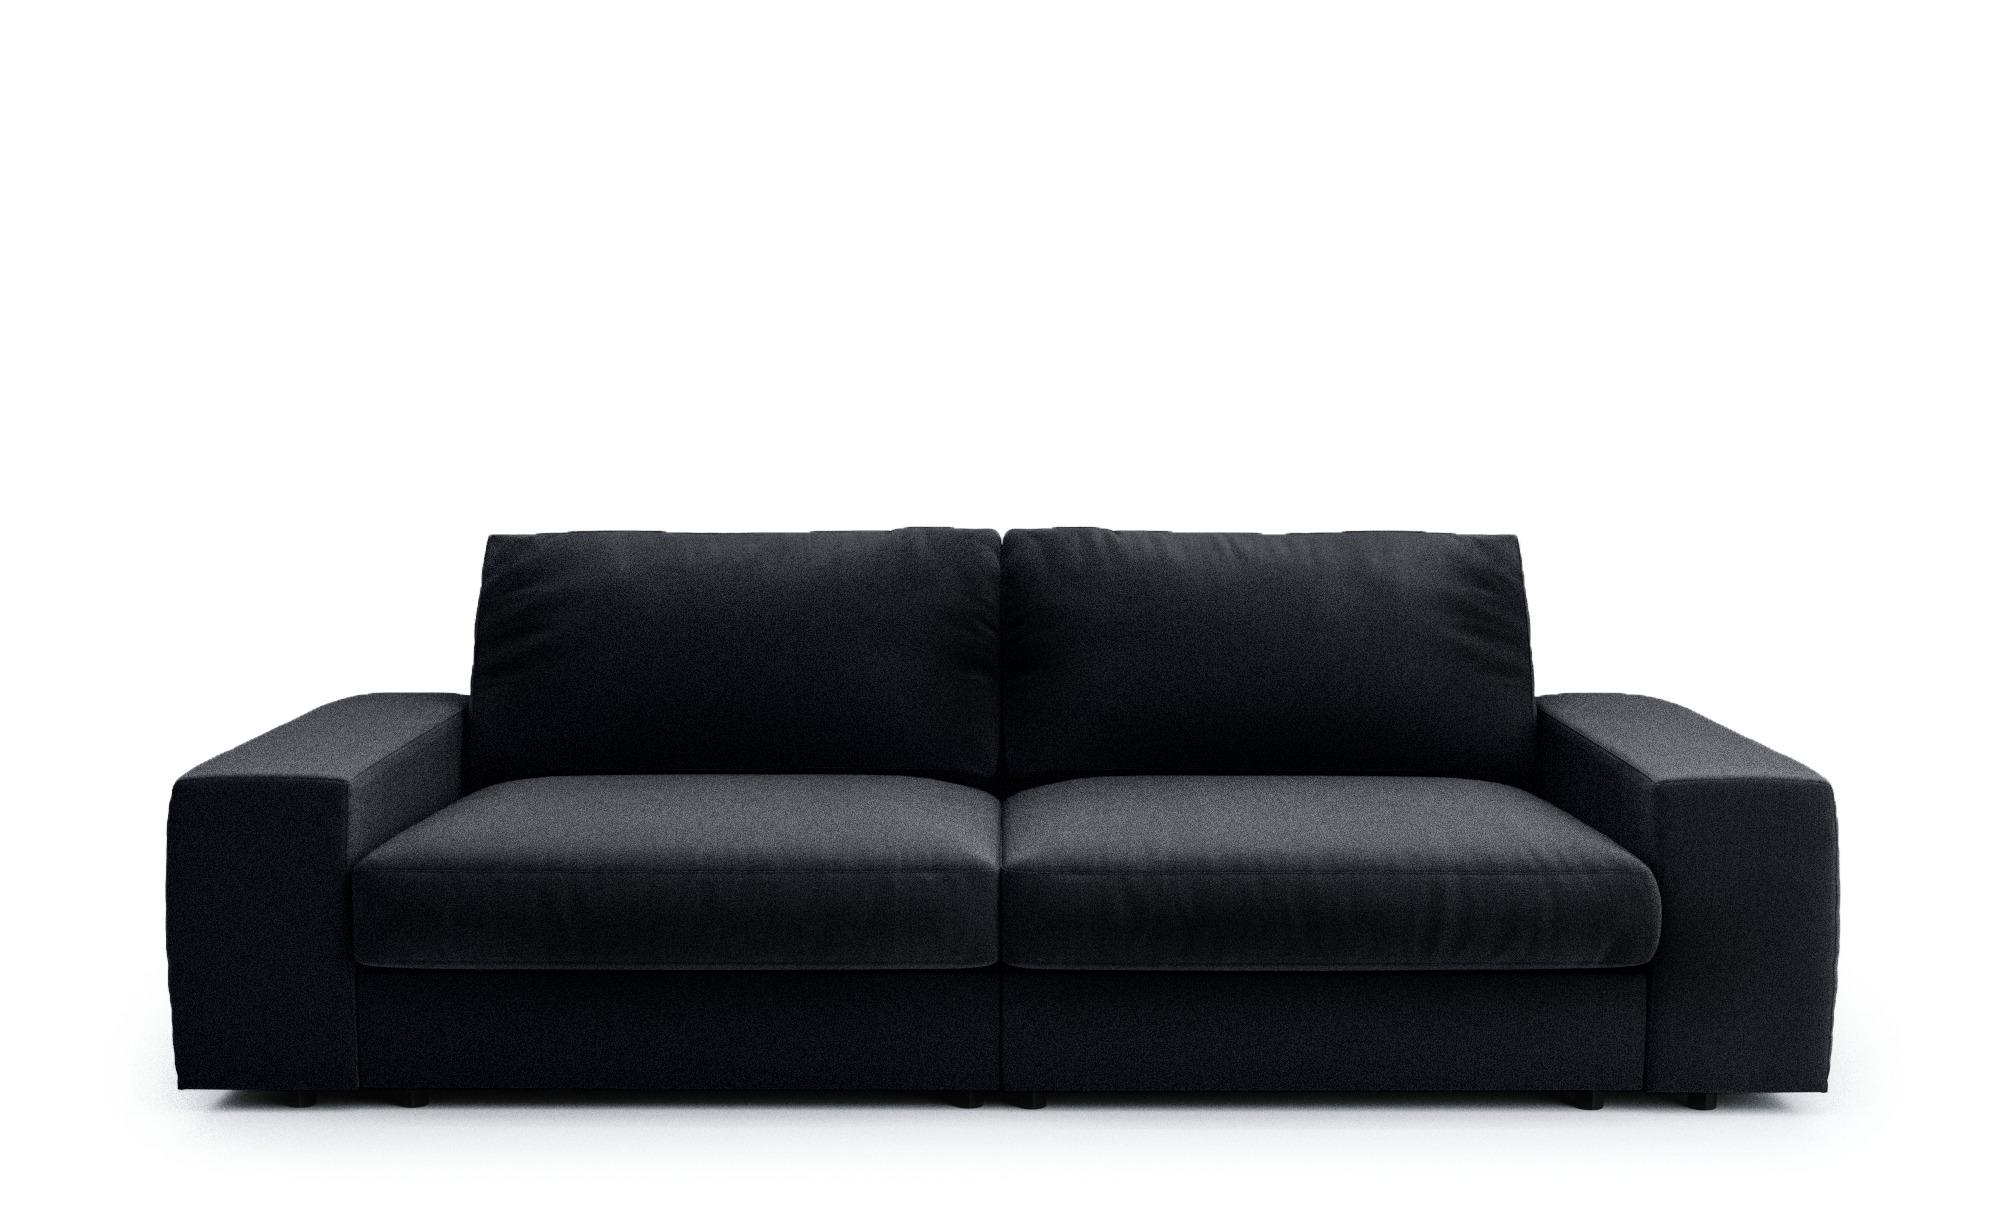 Big Sofa anthrazit - Flachgewebe Brooke ¦ grau ¦ Maße (cm): B: 262 H: 88 T: 120 Polstermöbel > Sofas > Big-Sofas - Höffner